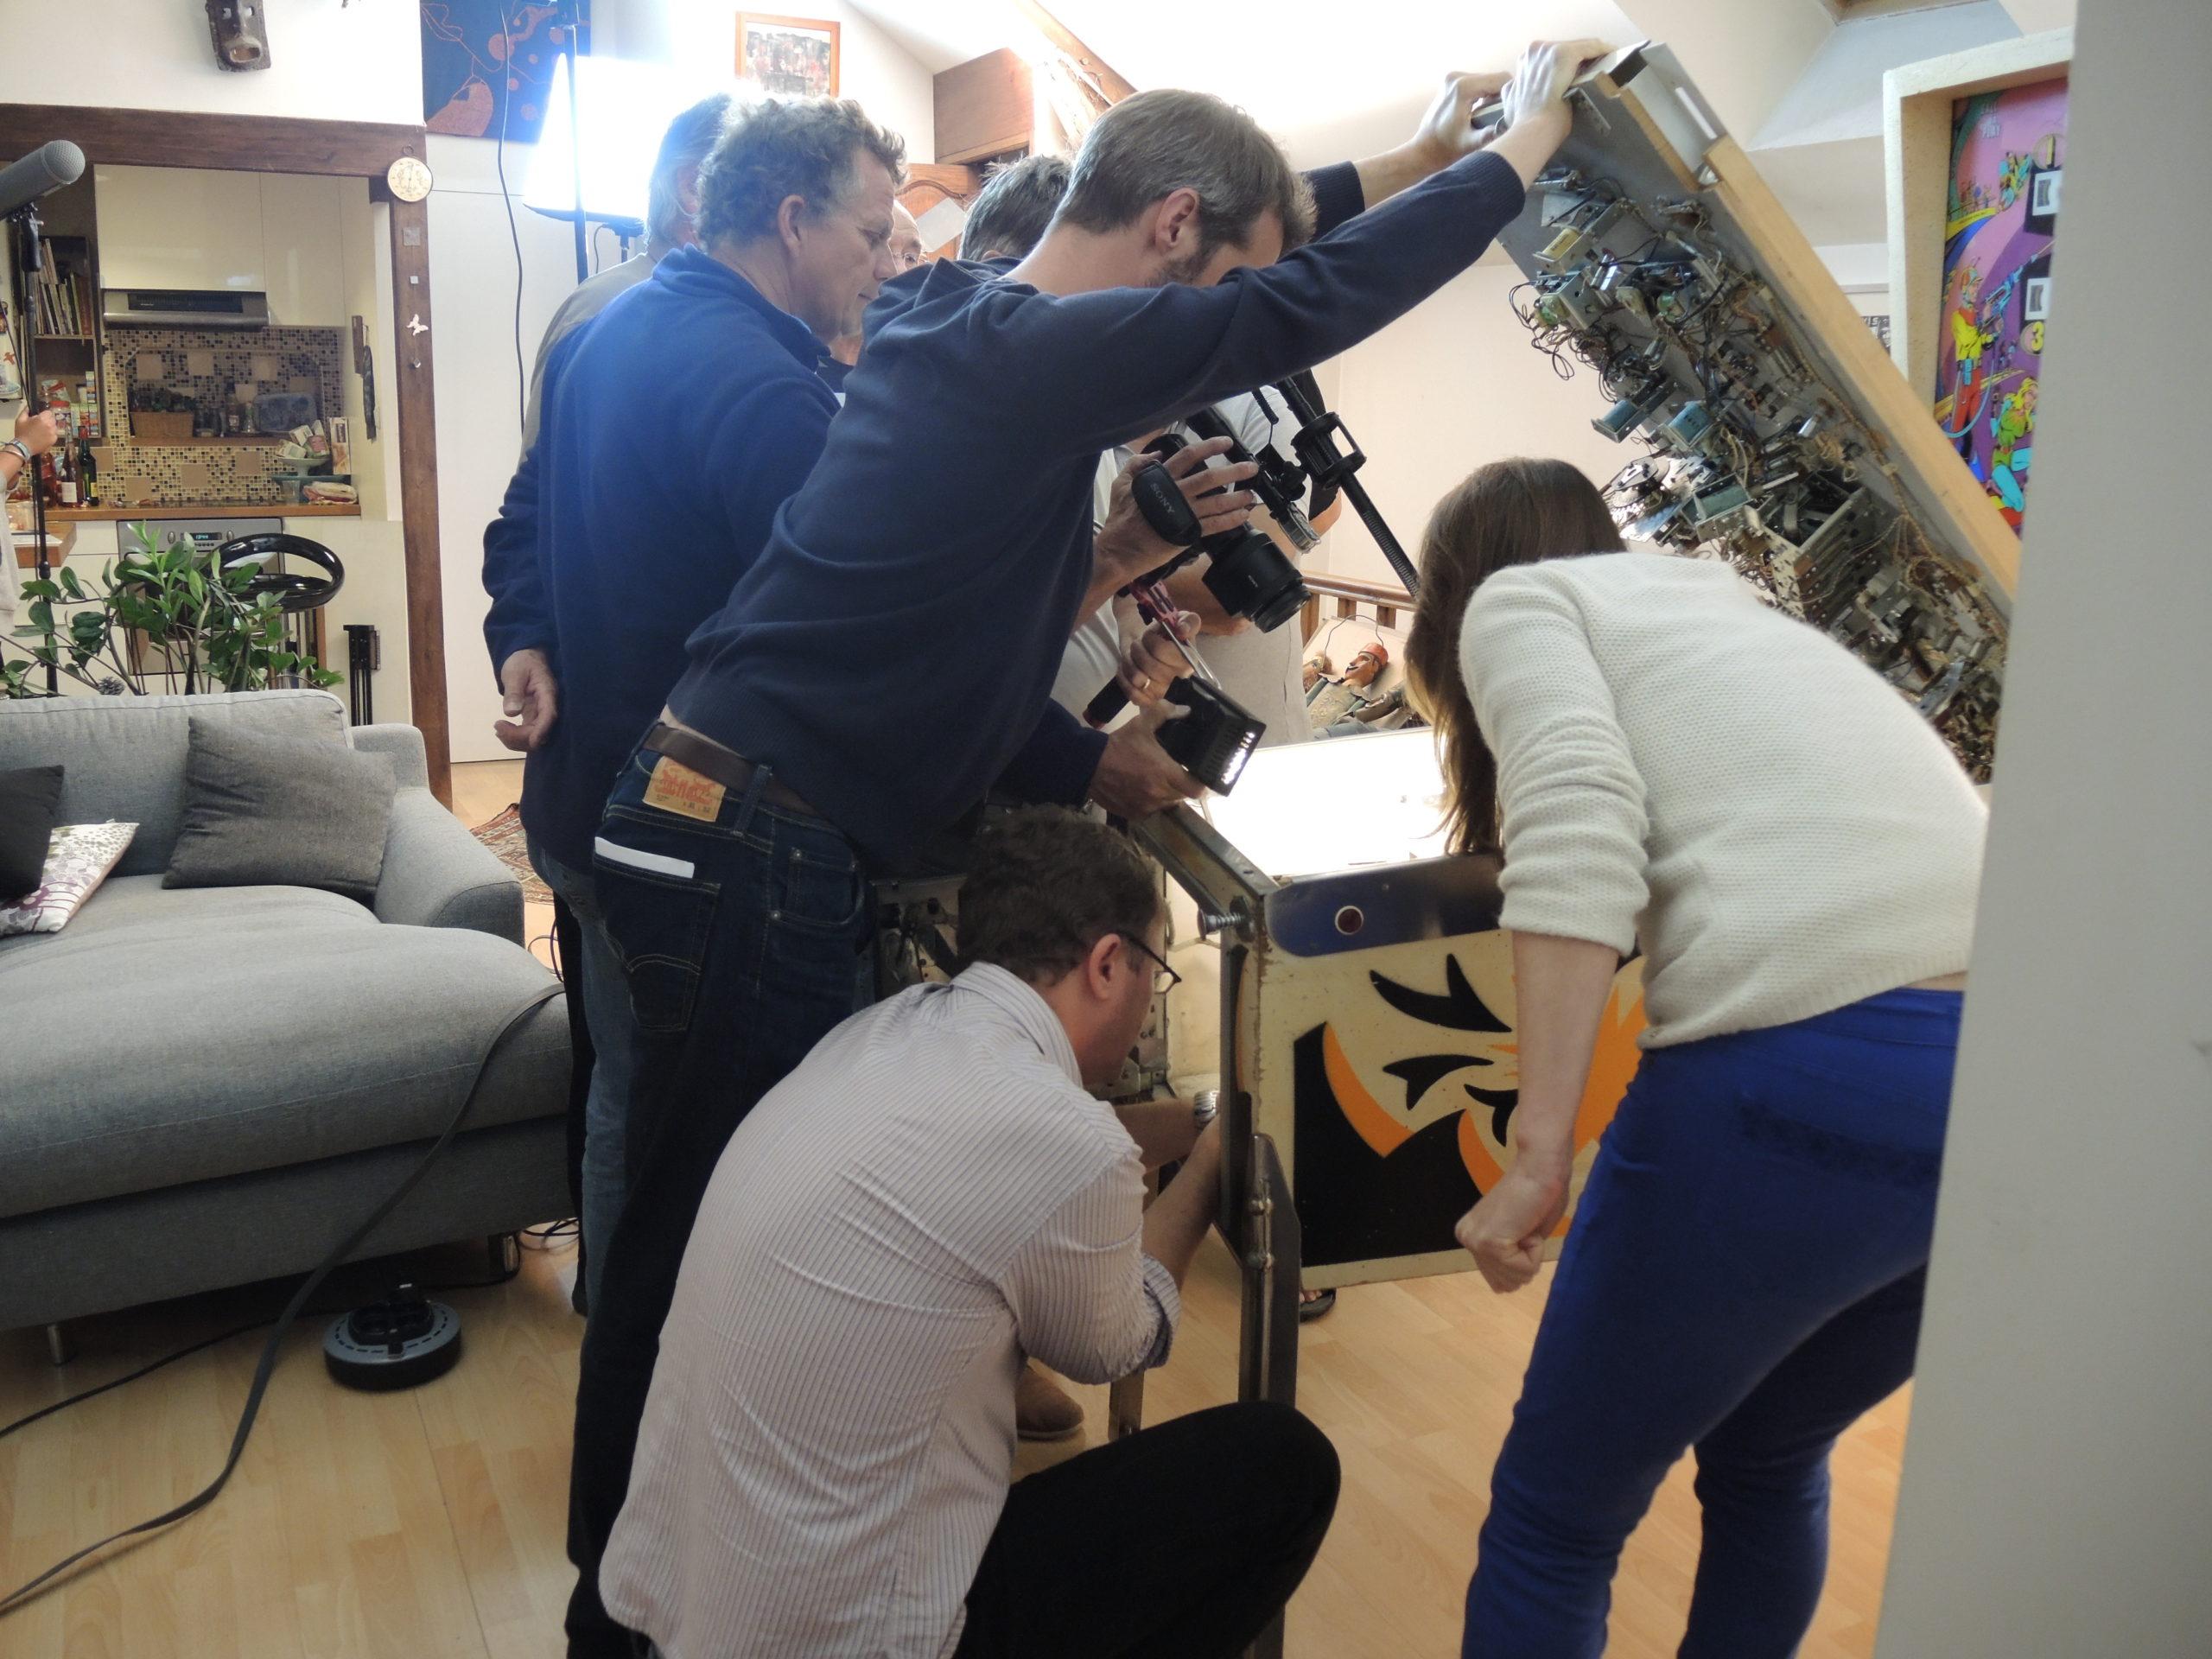 Game over photos tournage 36